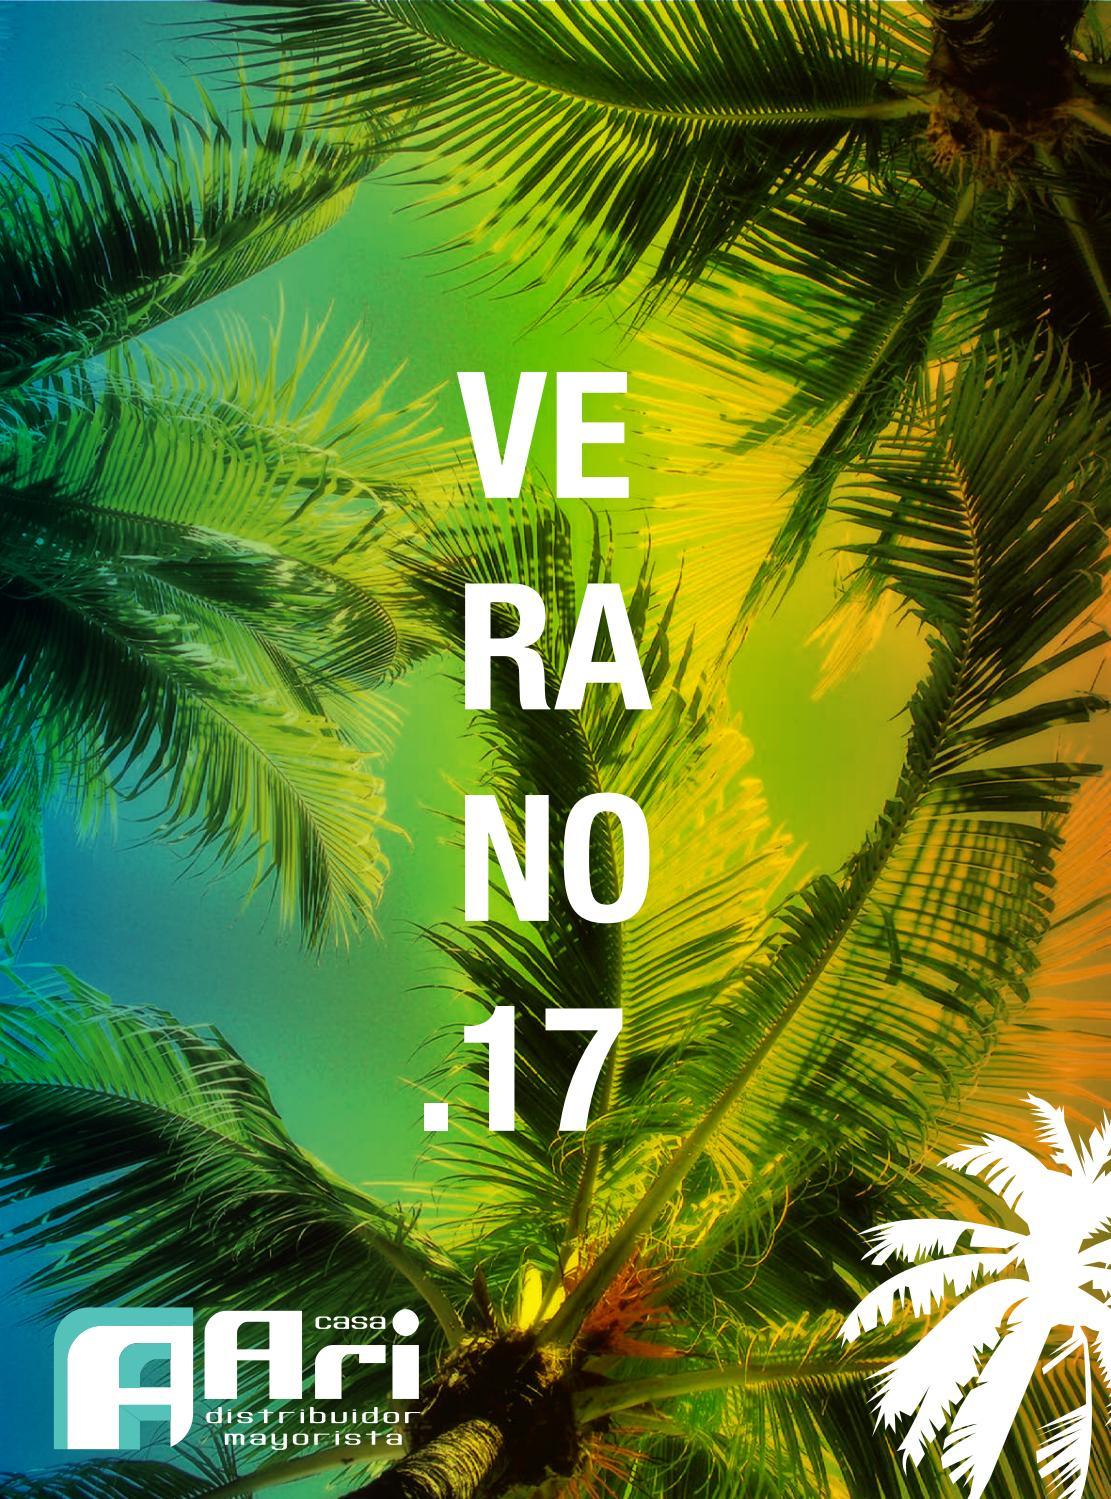 Catálogo Trajes de Baño - Verano 2017 by Casa Ari - Issuu